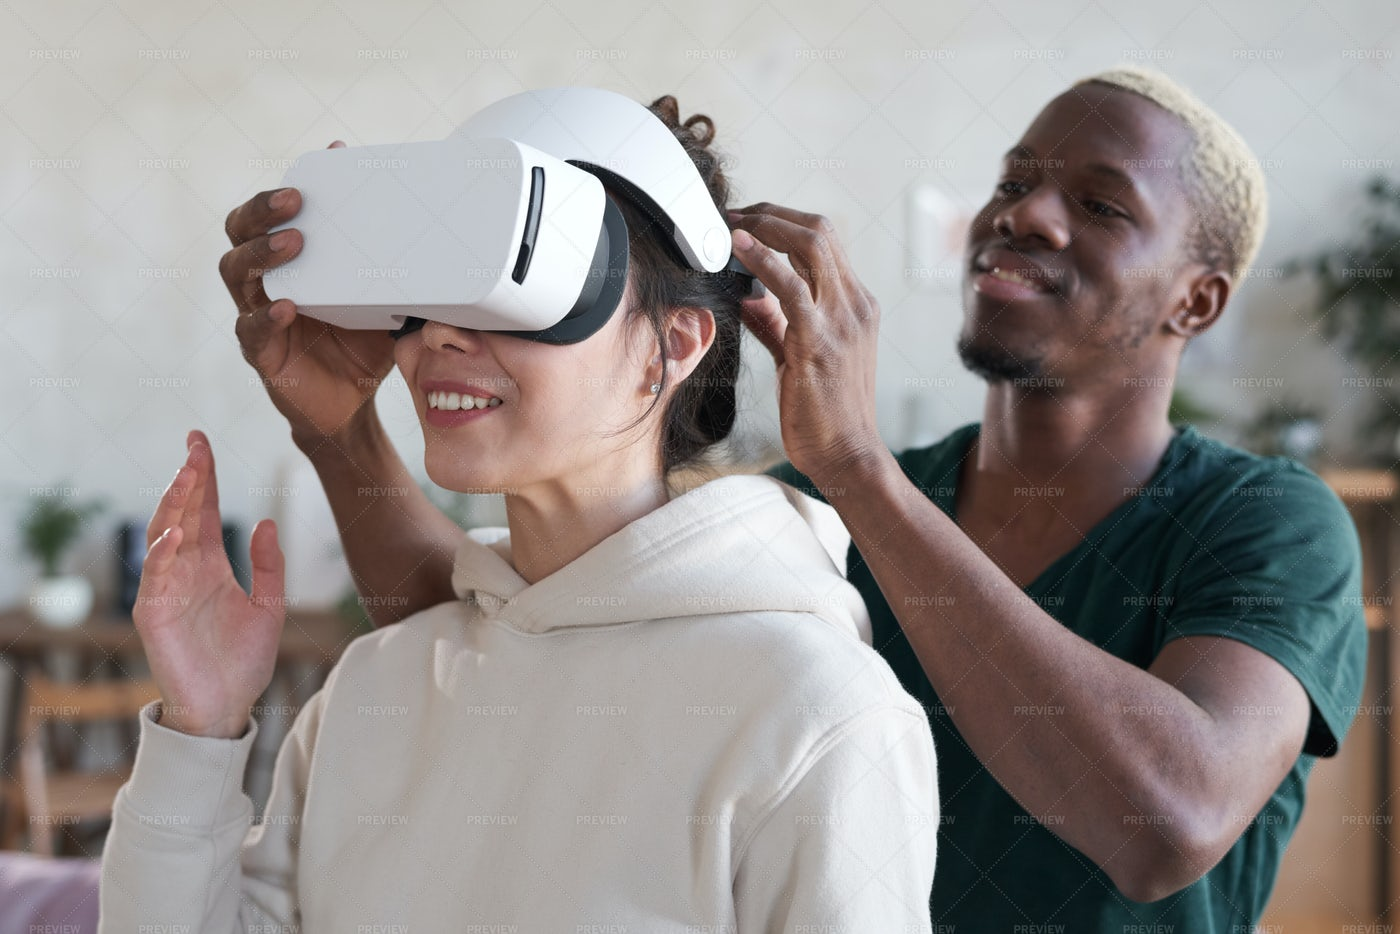 Man Showing Virtual Reality To Woman: Stock Photos